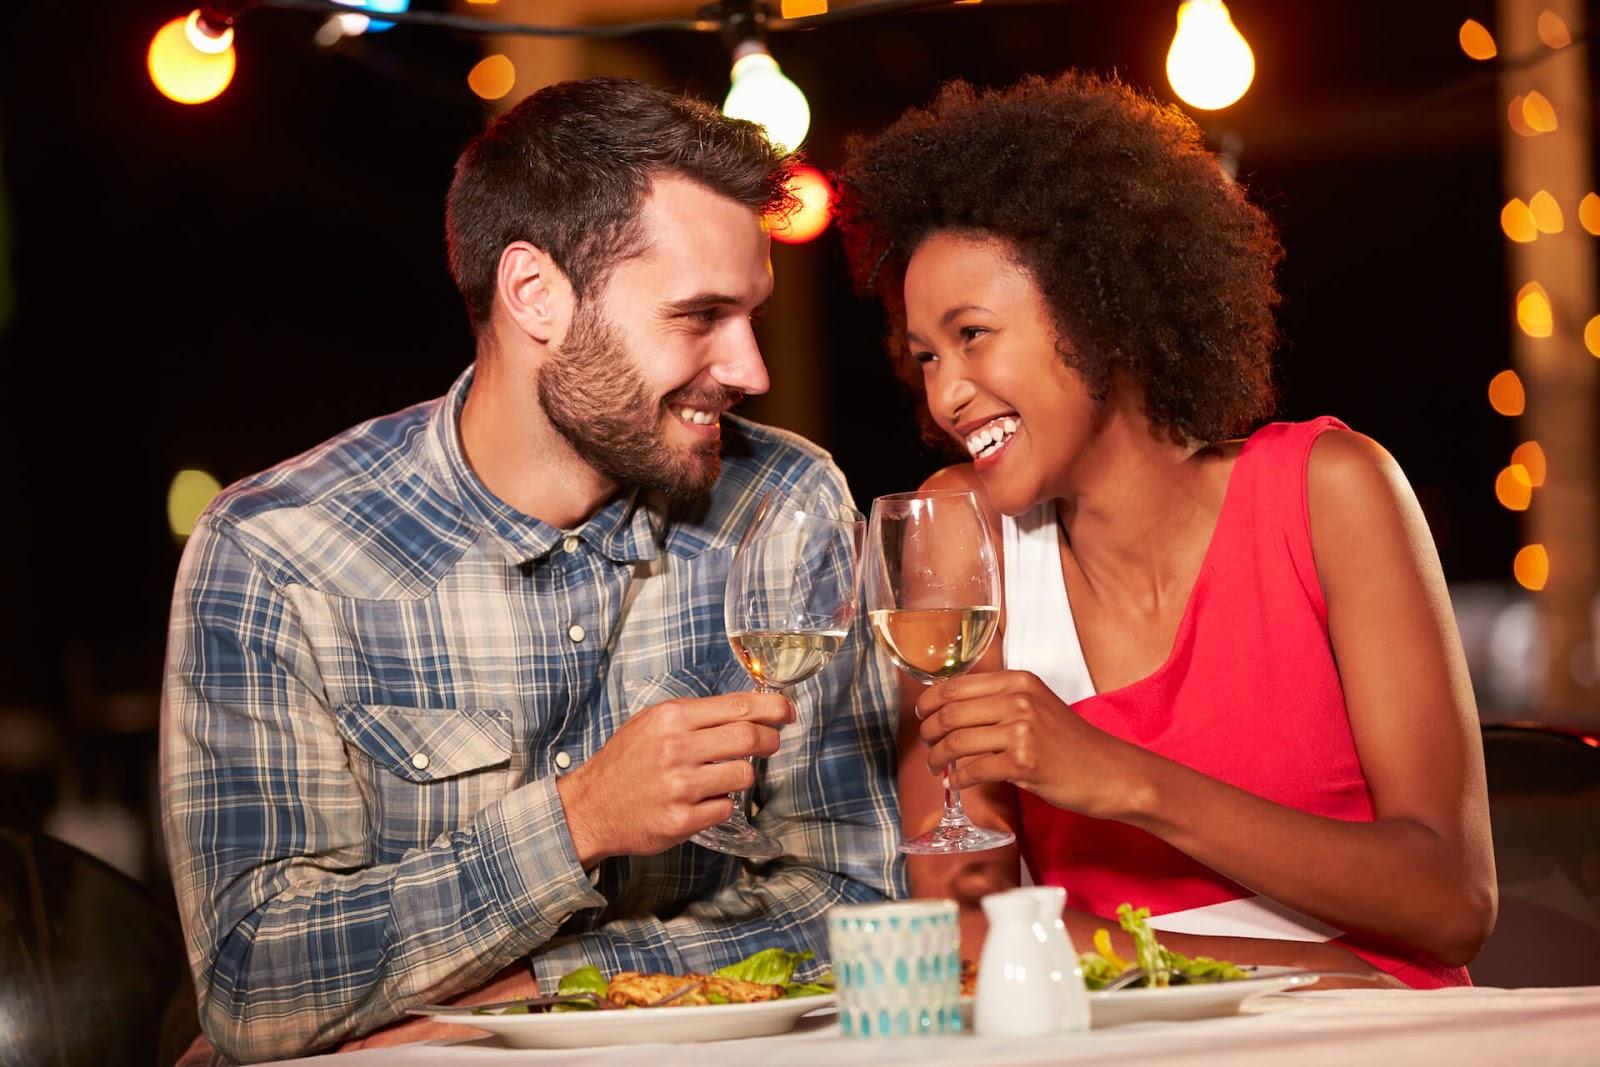 Man and woman eating at a restaurant and having fun